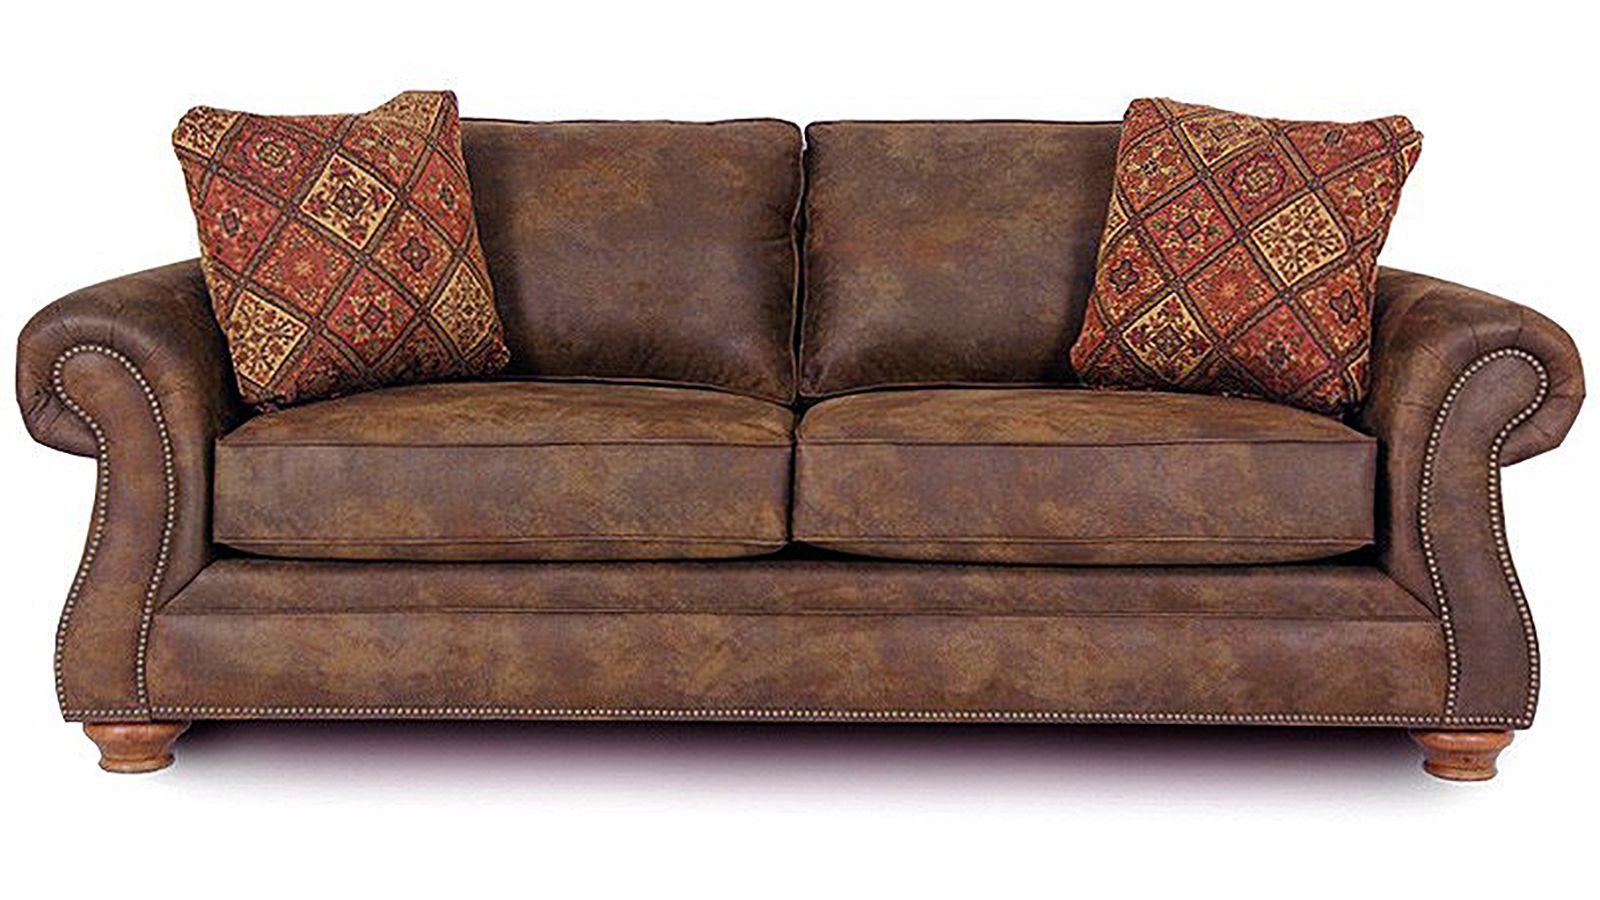 Texas Brown Queen Sleeper Sofa, , large